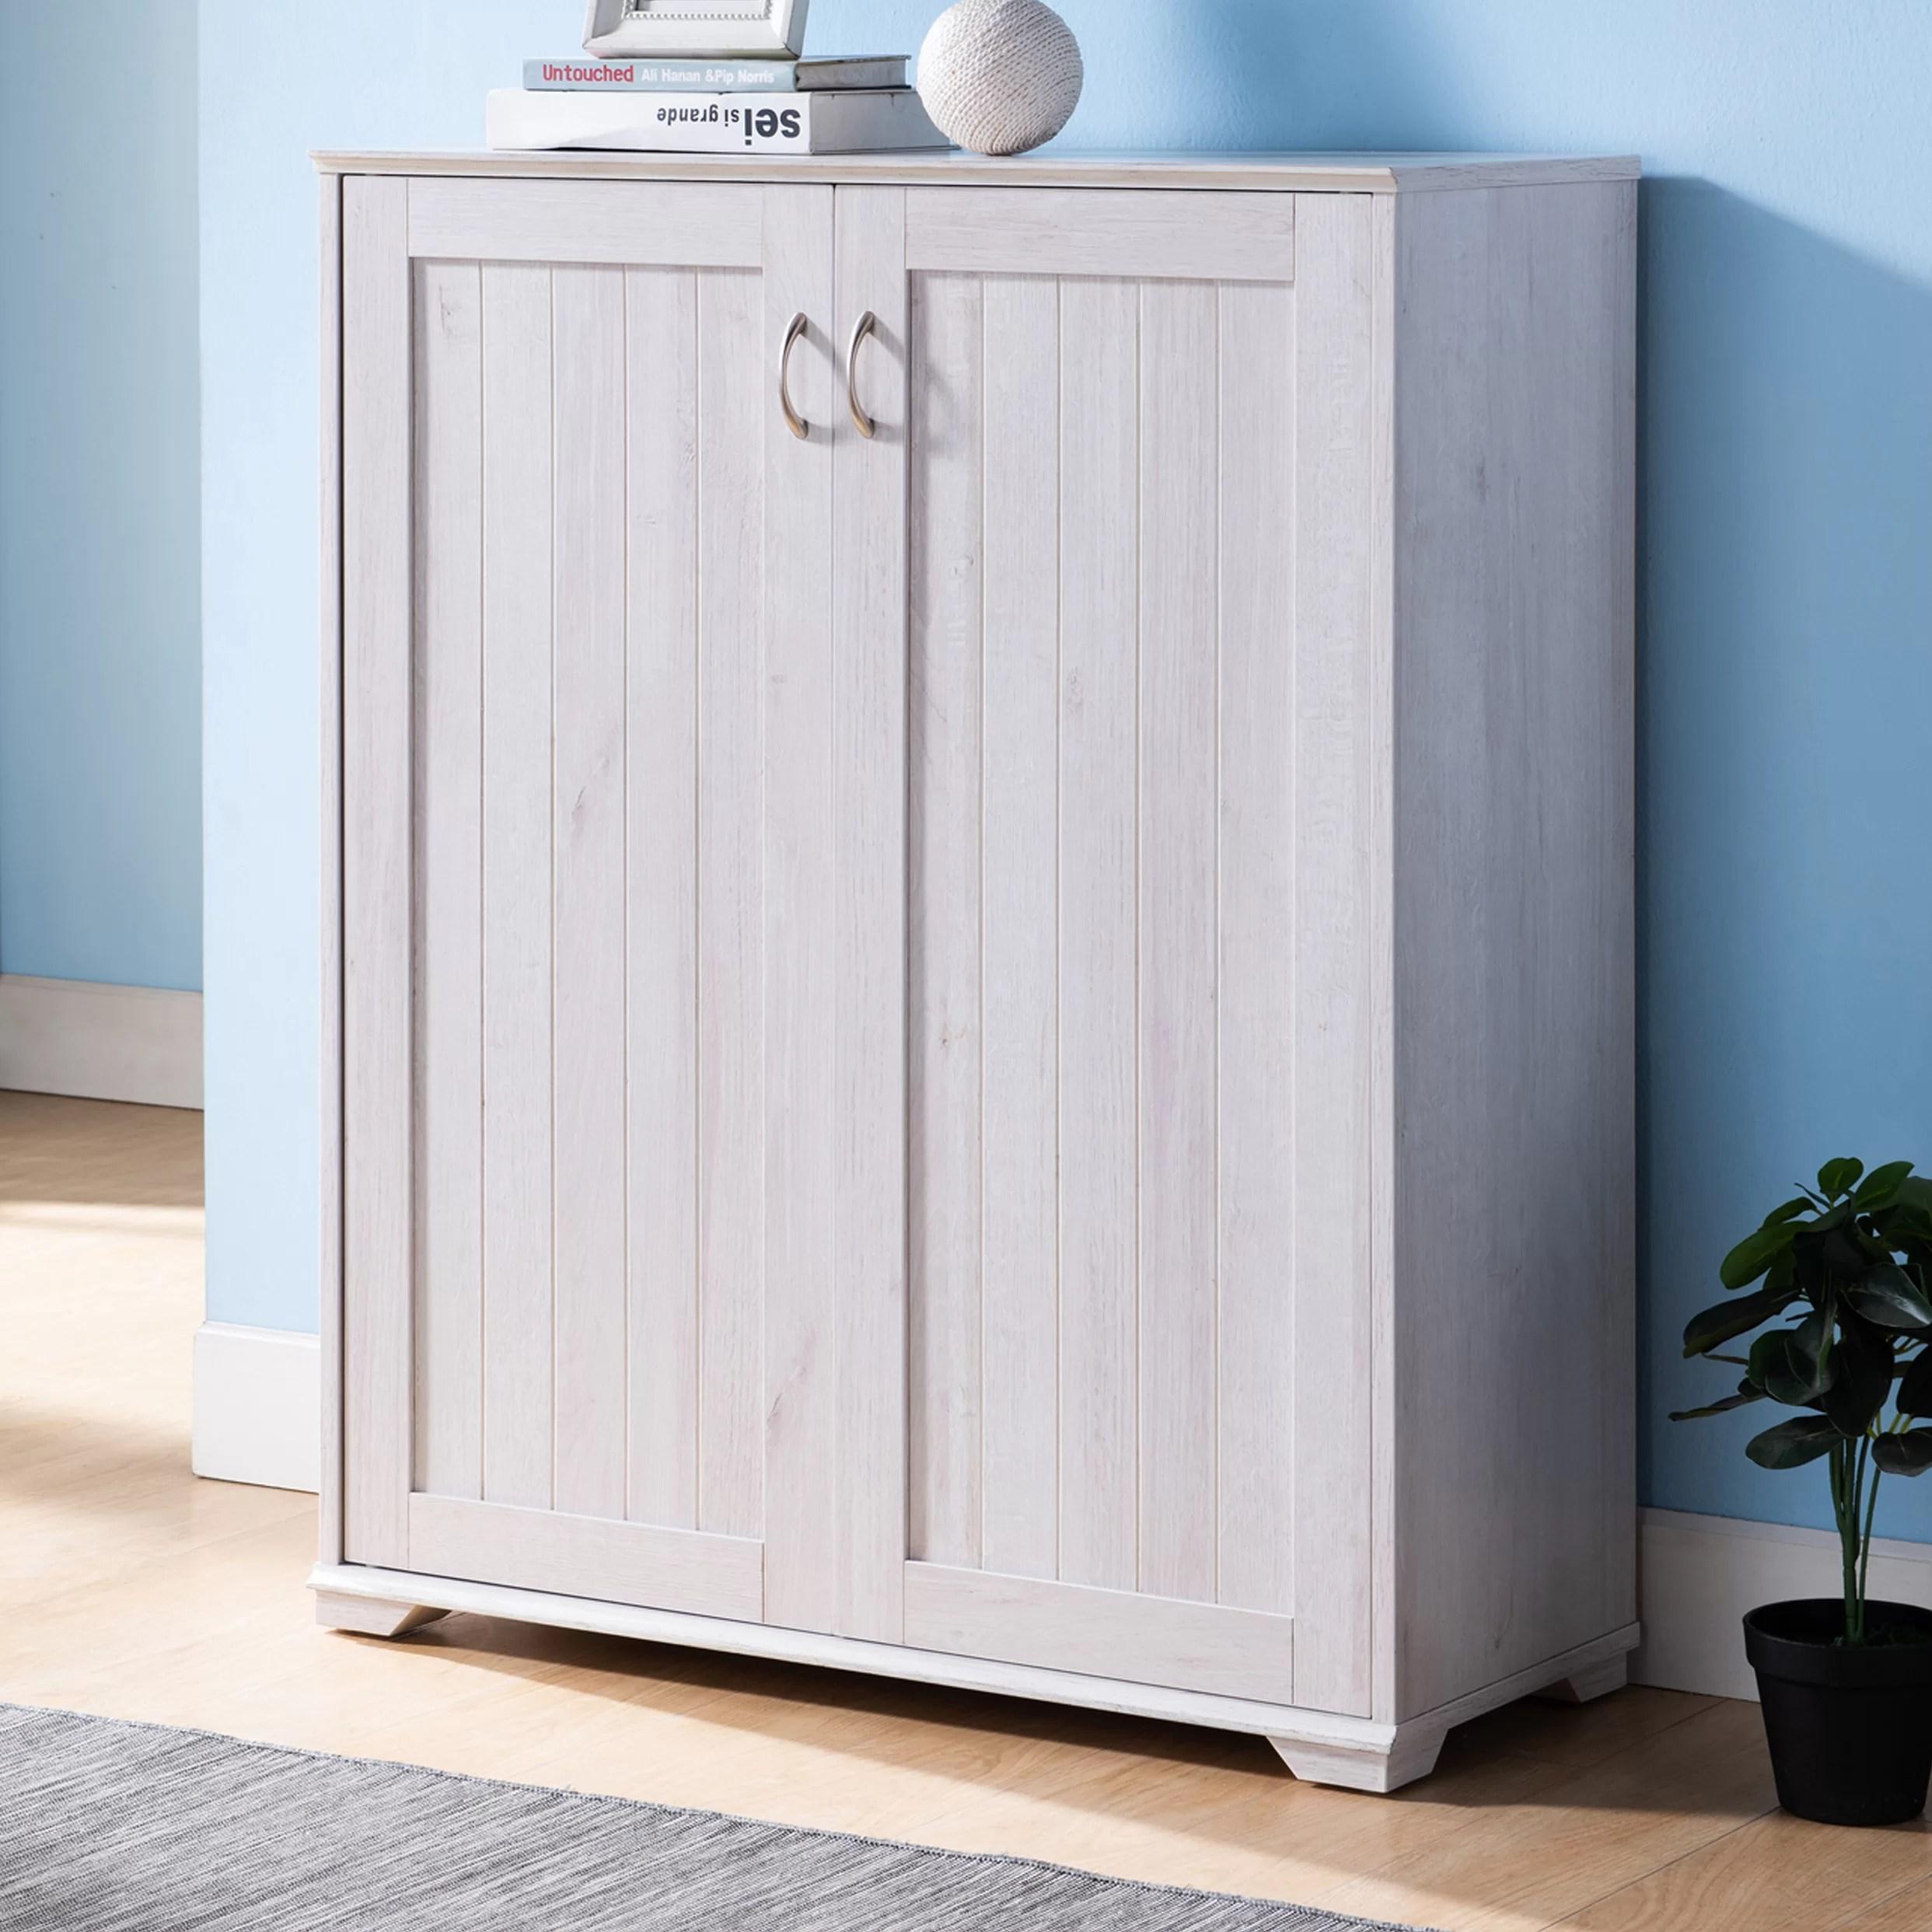 kohl 5 tier 15 pair shoe storage cabinet